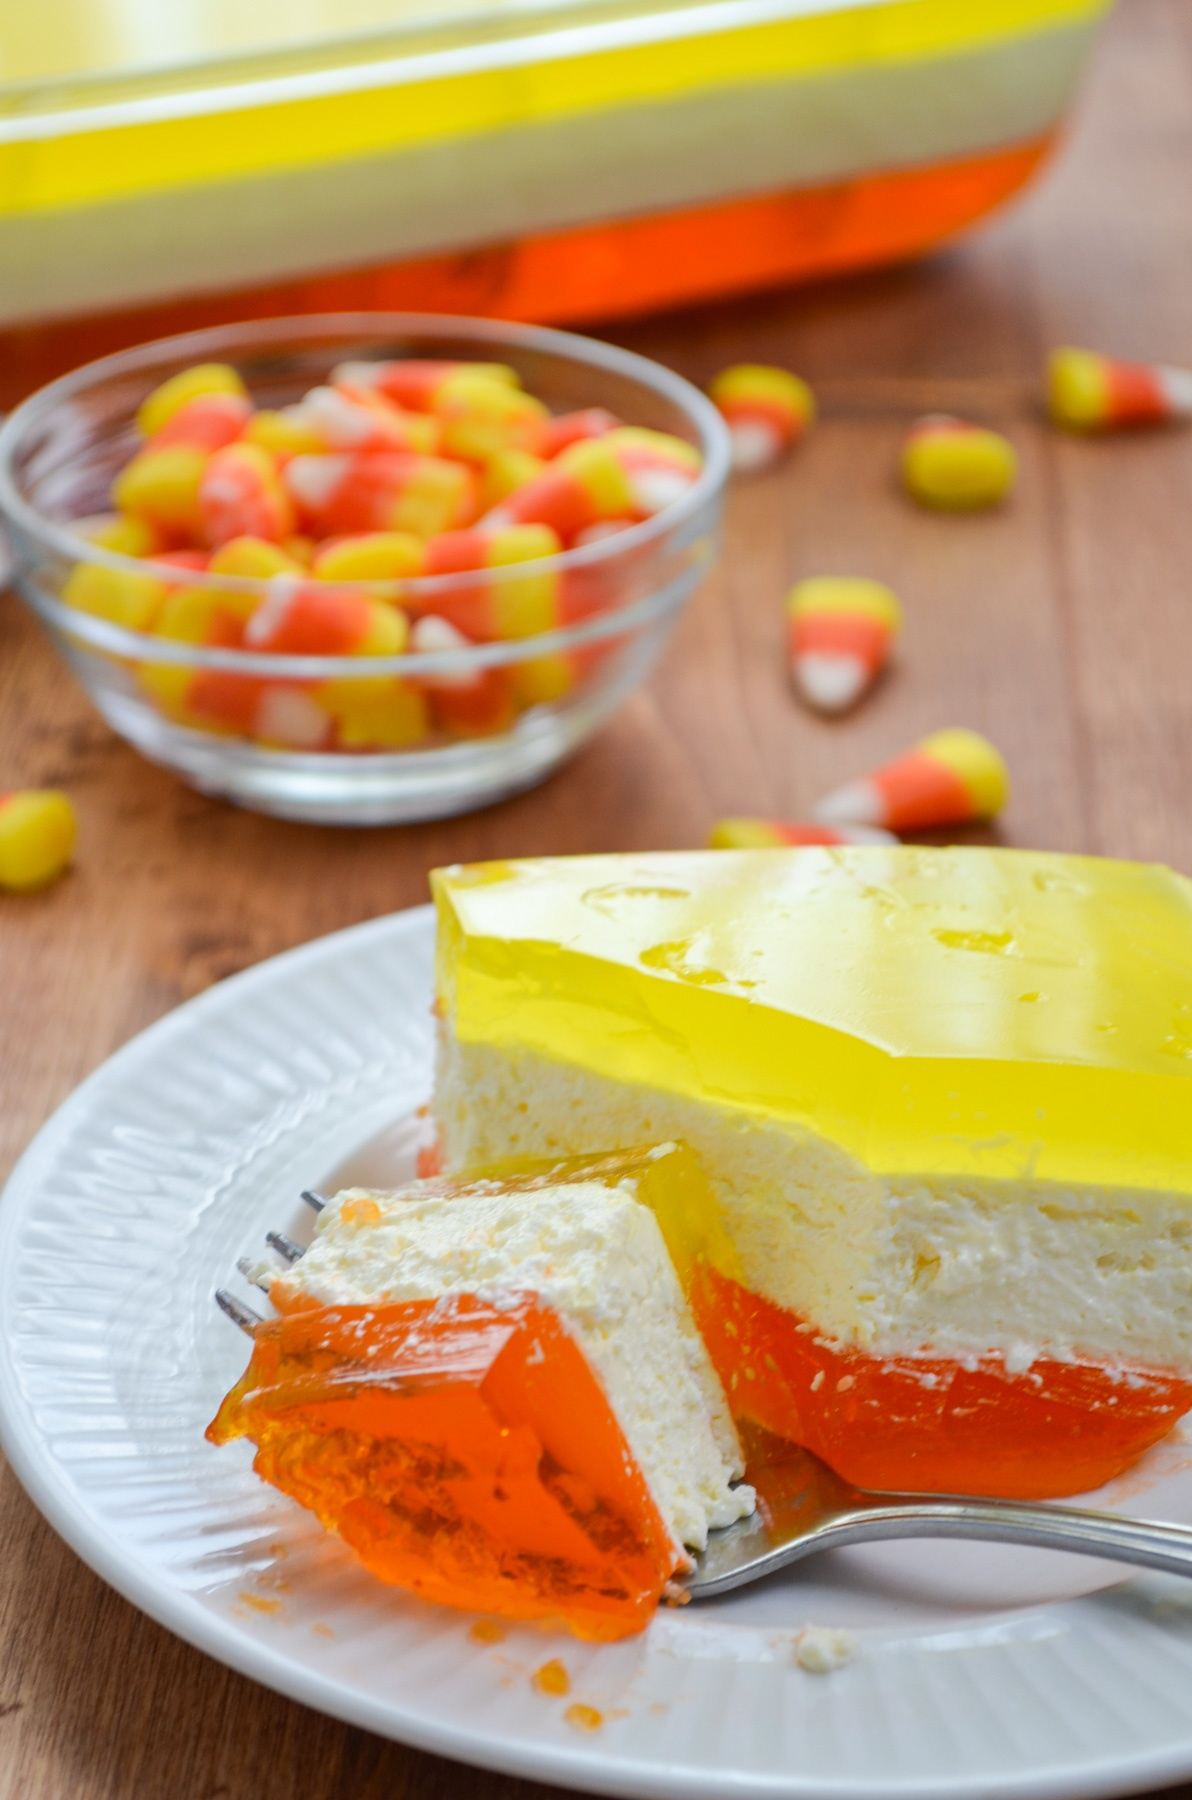 A slice of layered Halloween Jello.